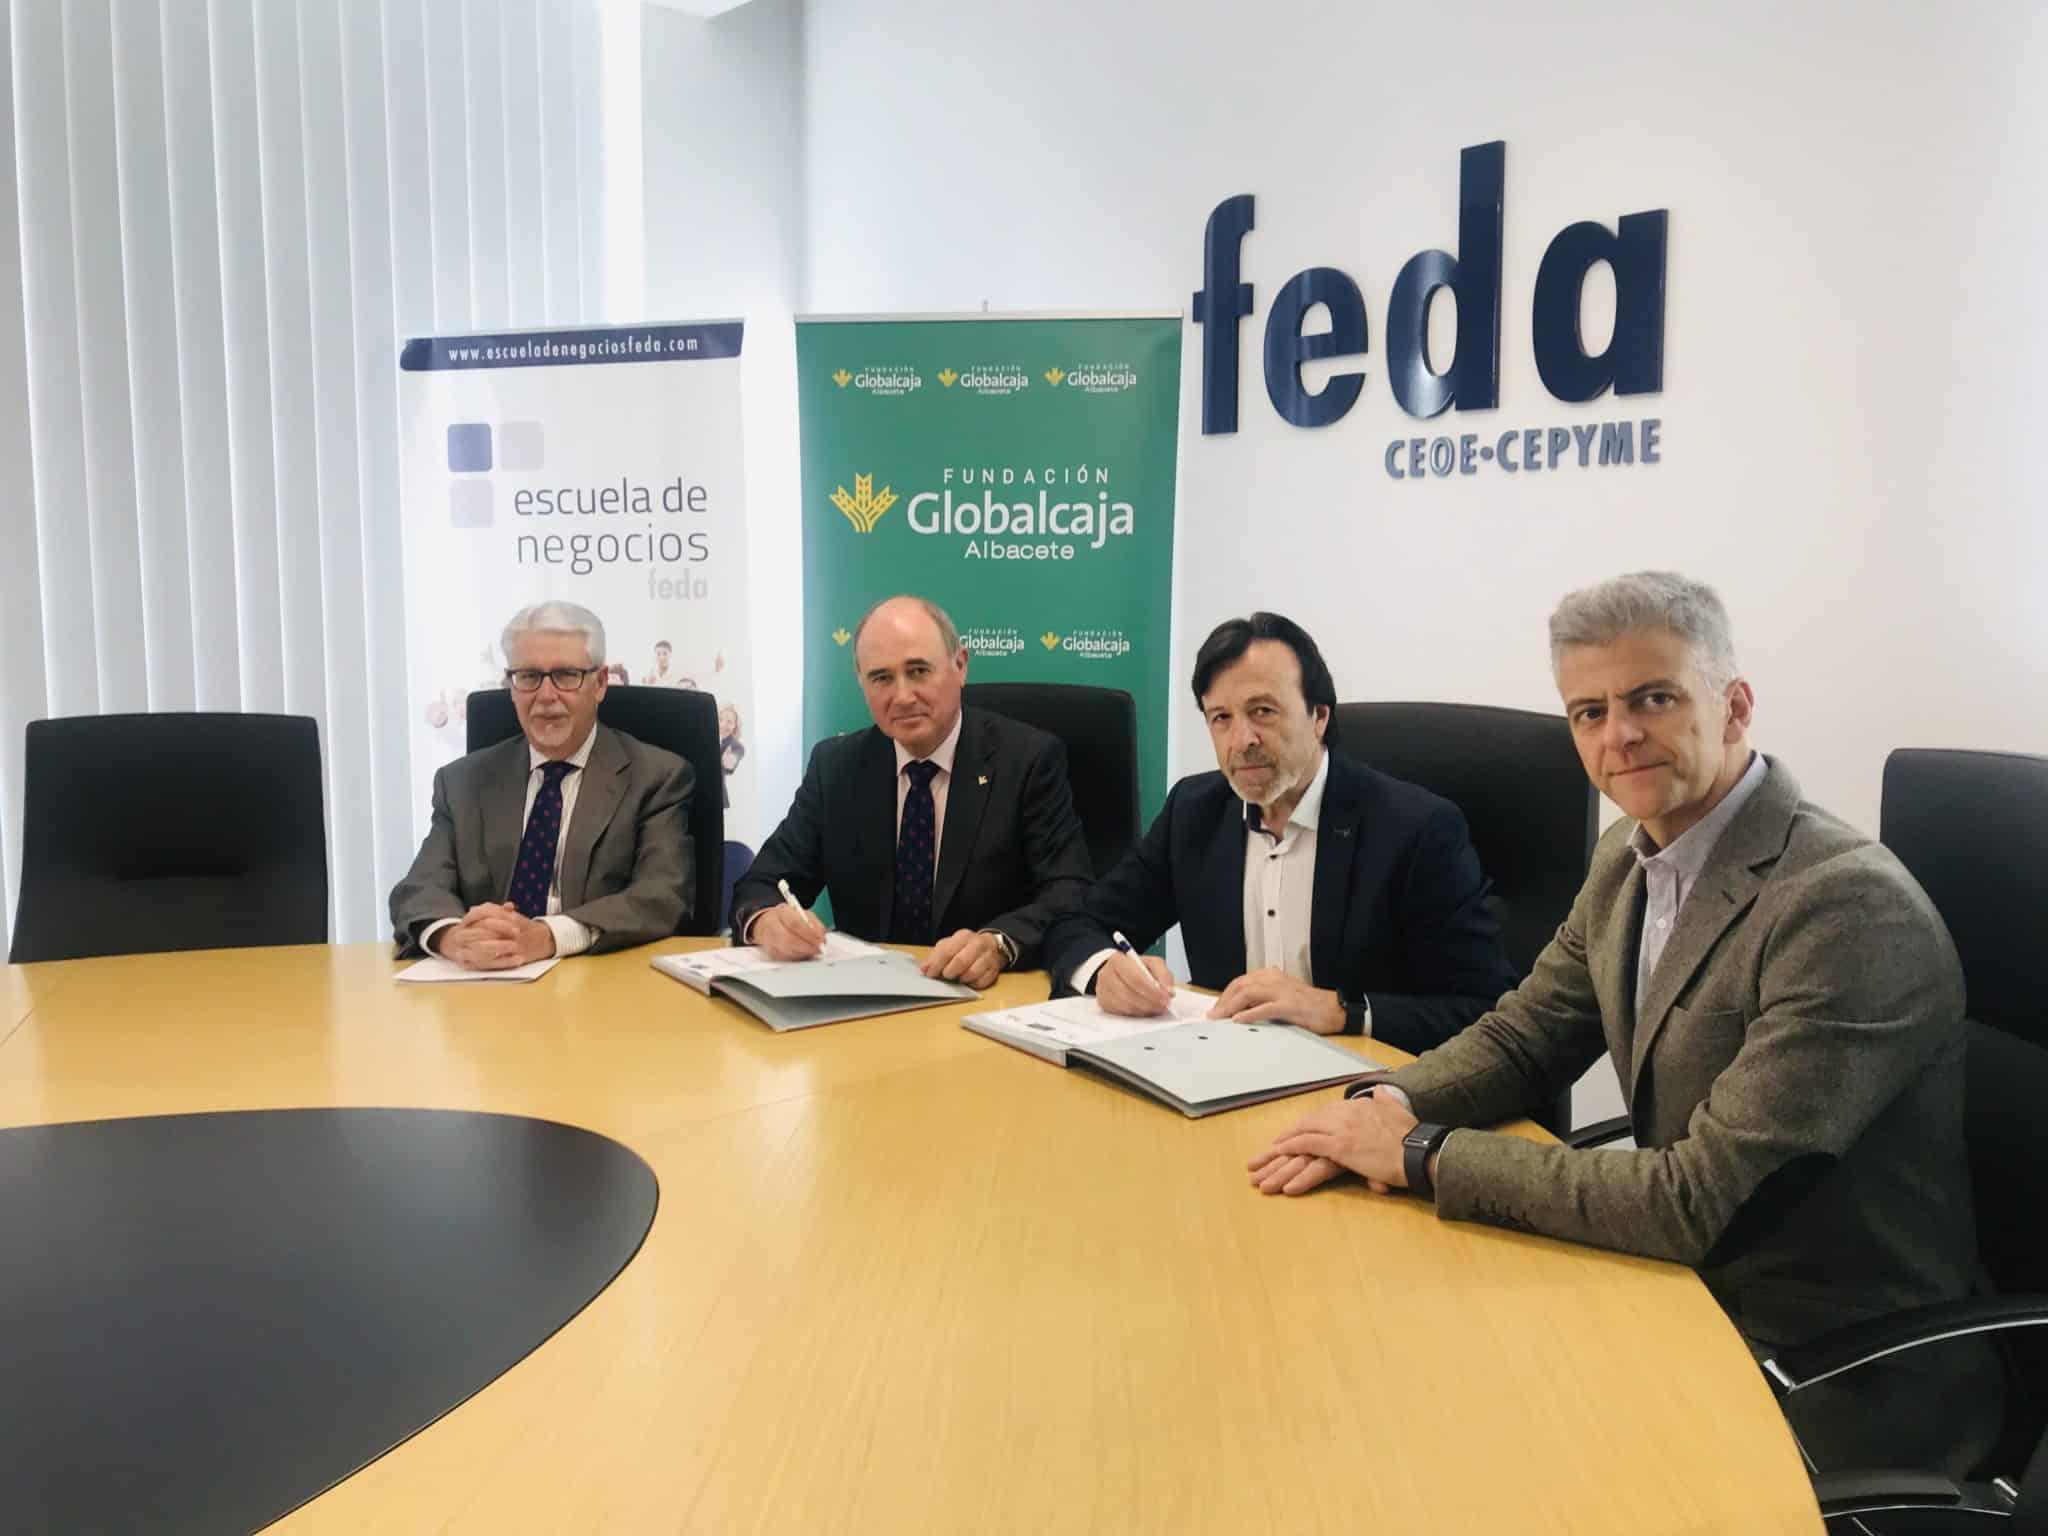 https://blog.globalcaja.es/wp-content/uploads/2019/03/Convenio-Fundación-Globalcaja-FEDA-1.jpg